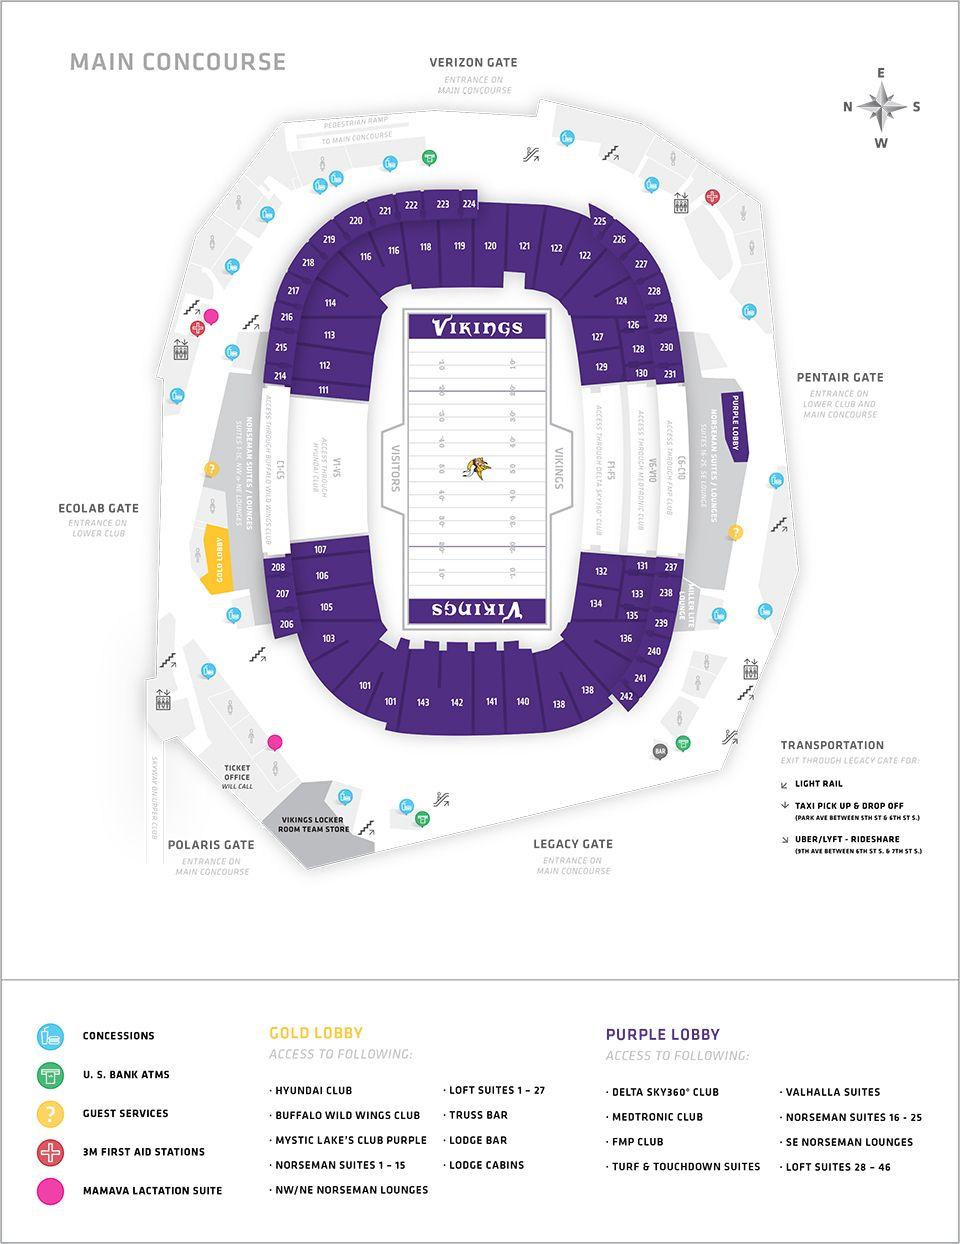 Minnesota vikings   bank stadium map seating chart also stuff rh pinterest